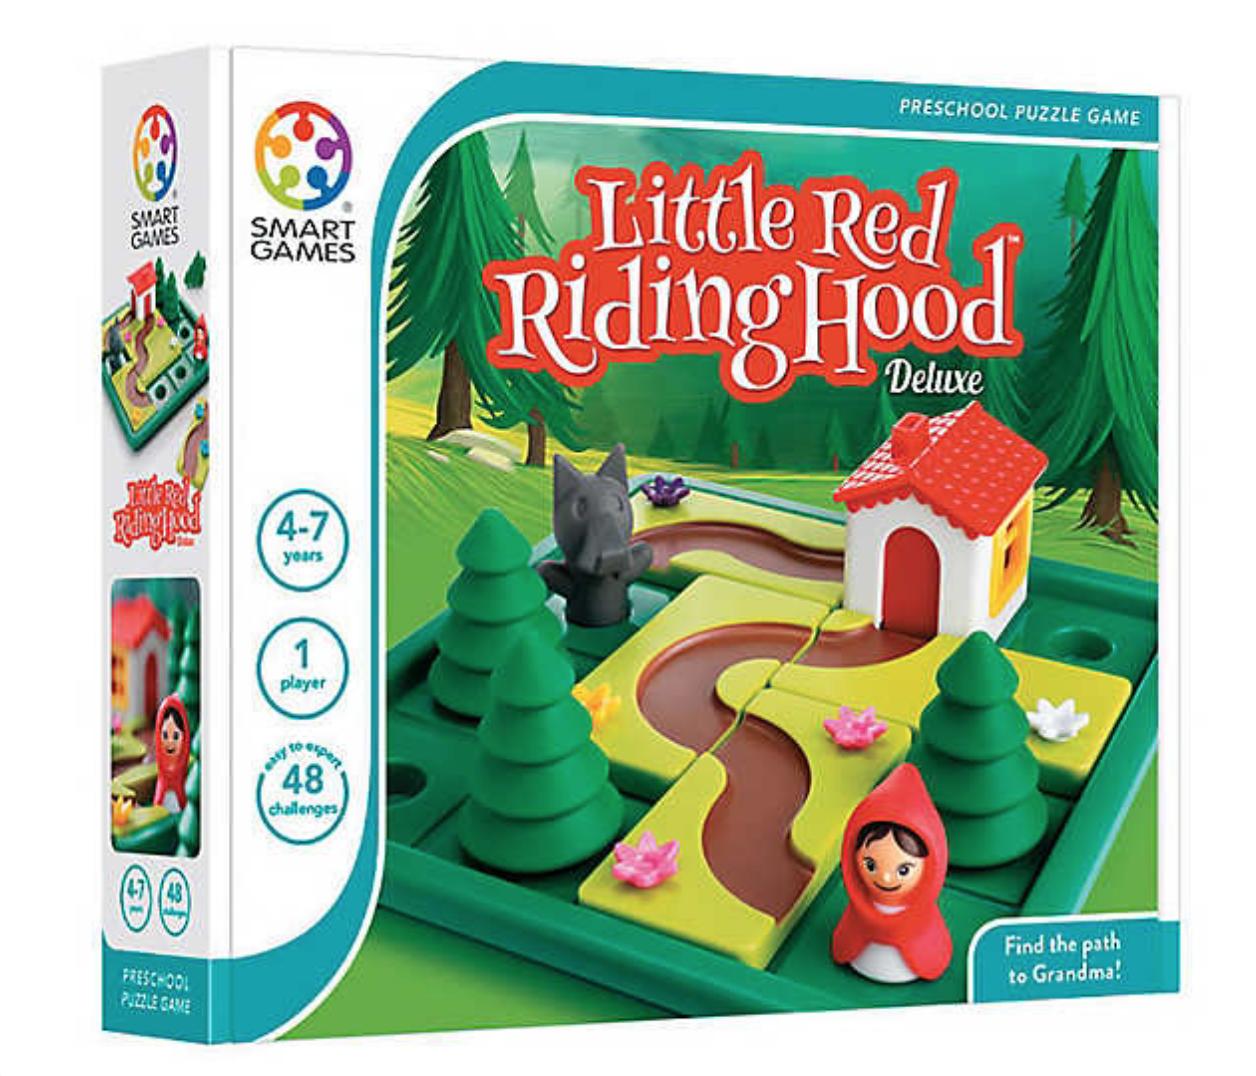 10 Fun Board Games for Preschoolers - Little Red Riding Hood Deluxe